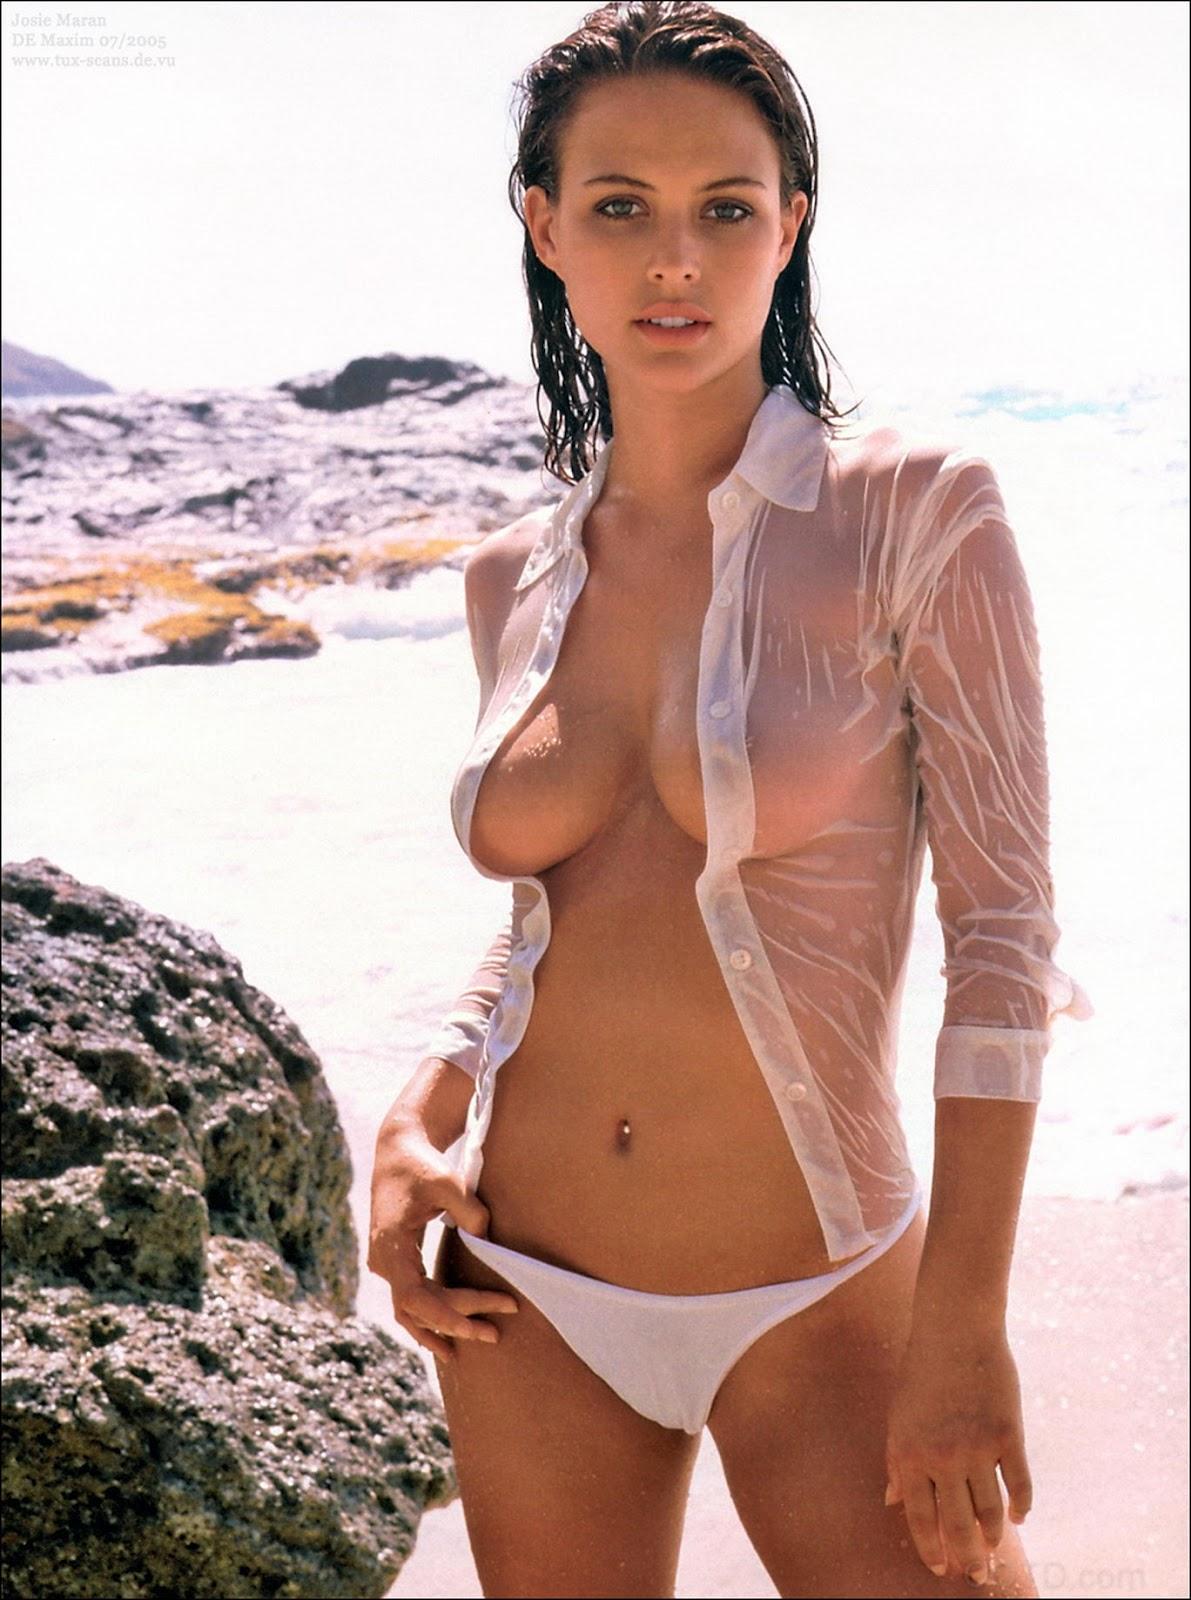 http://3.bp.blogspot.com/-VNBJOtE40jA/T_Z7-EvWVAI/AAAAAAAAE3Q/wP1fcQIEtE0/s1600/josie-maran-hot-bikini-lingerie-boobs-04.JPG